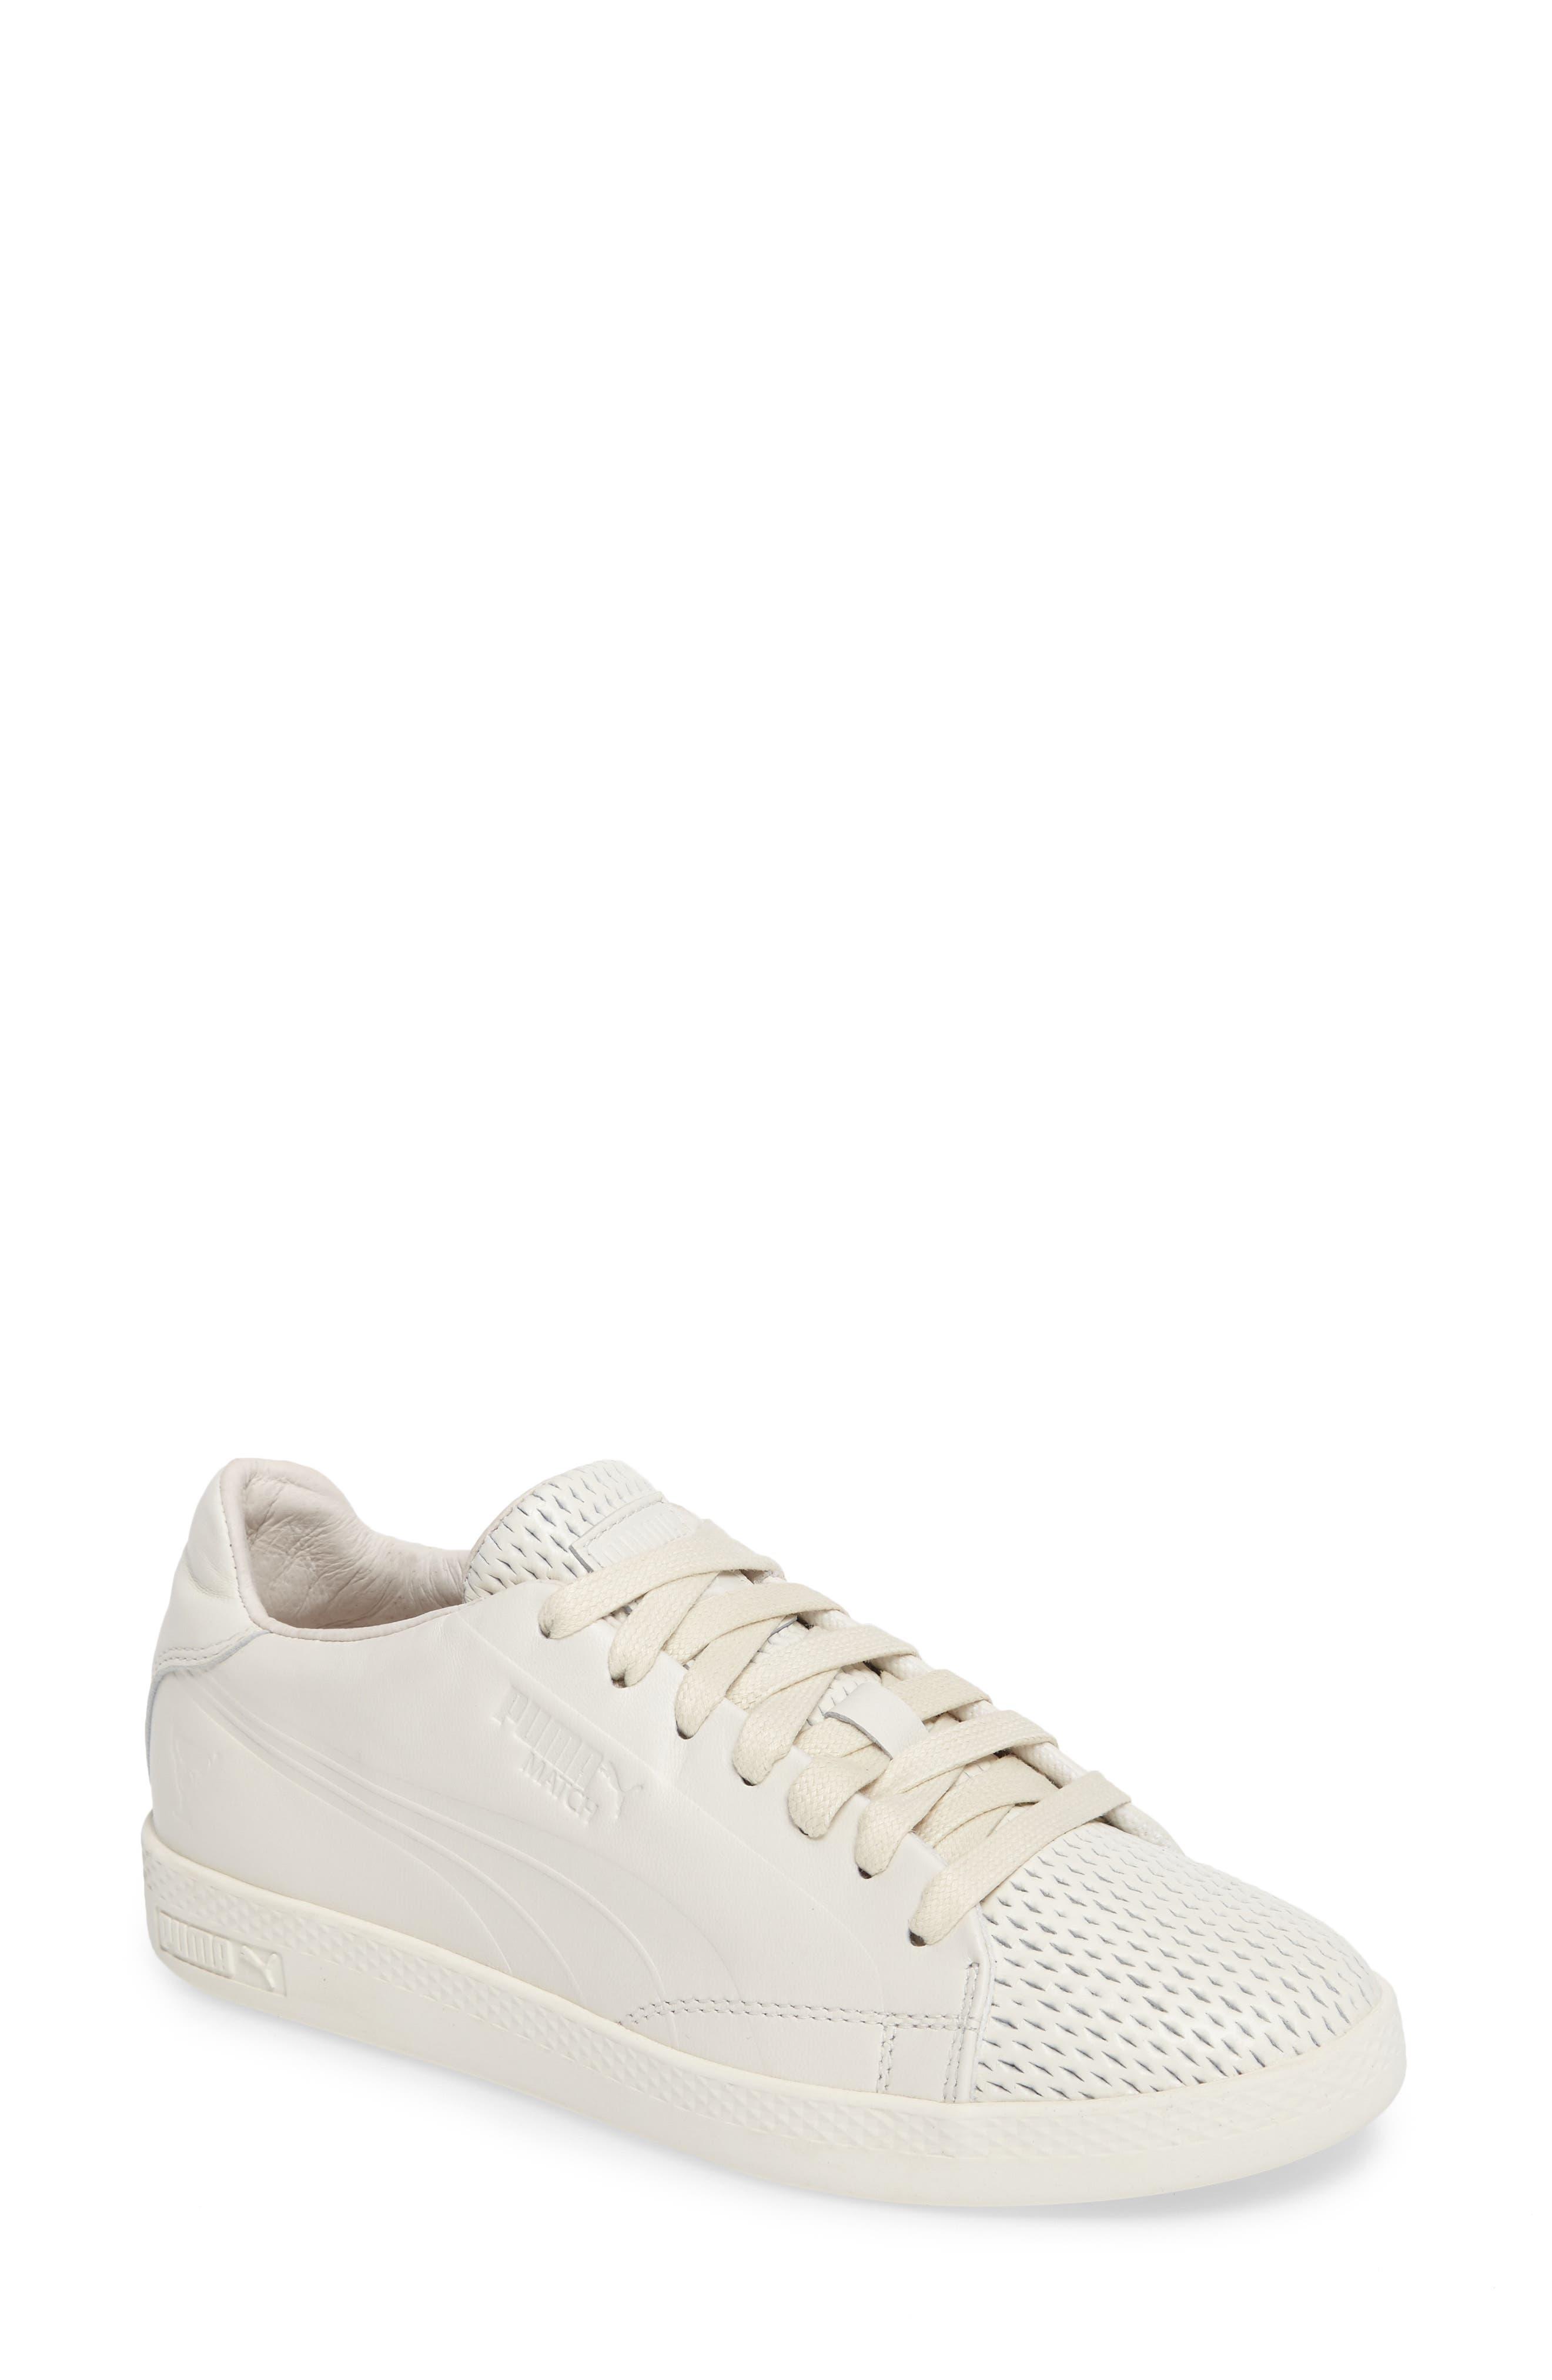 Match Lo Open Sneaker,                         Main,                         color,